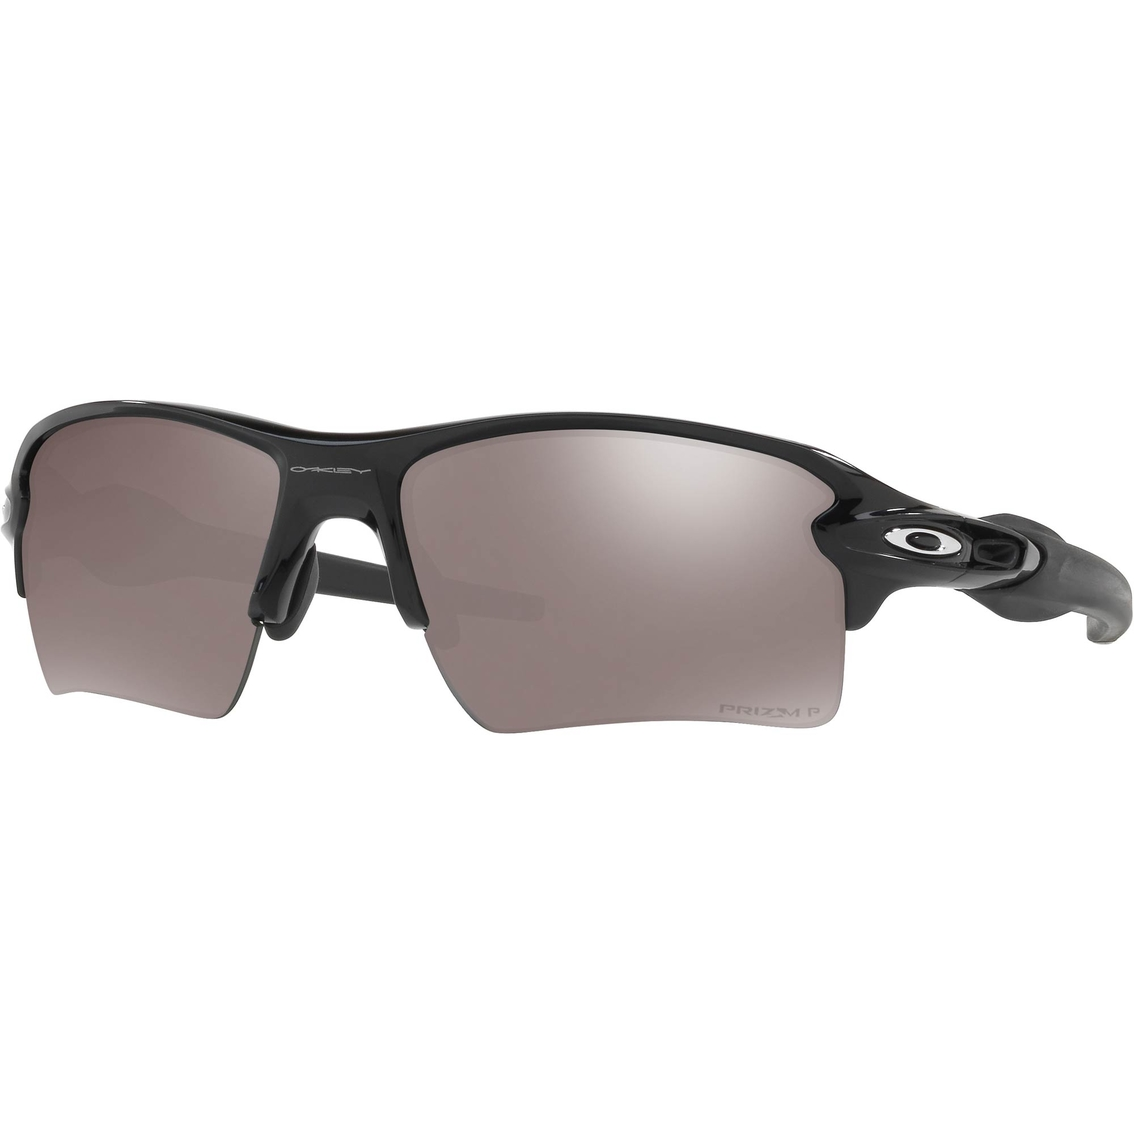 b035533ae8 Oakley Flak 2.0 Xl Matte Black prizm Daily Polarized Sunglasses 9188 ...